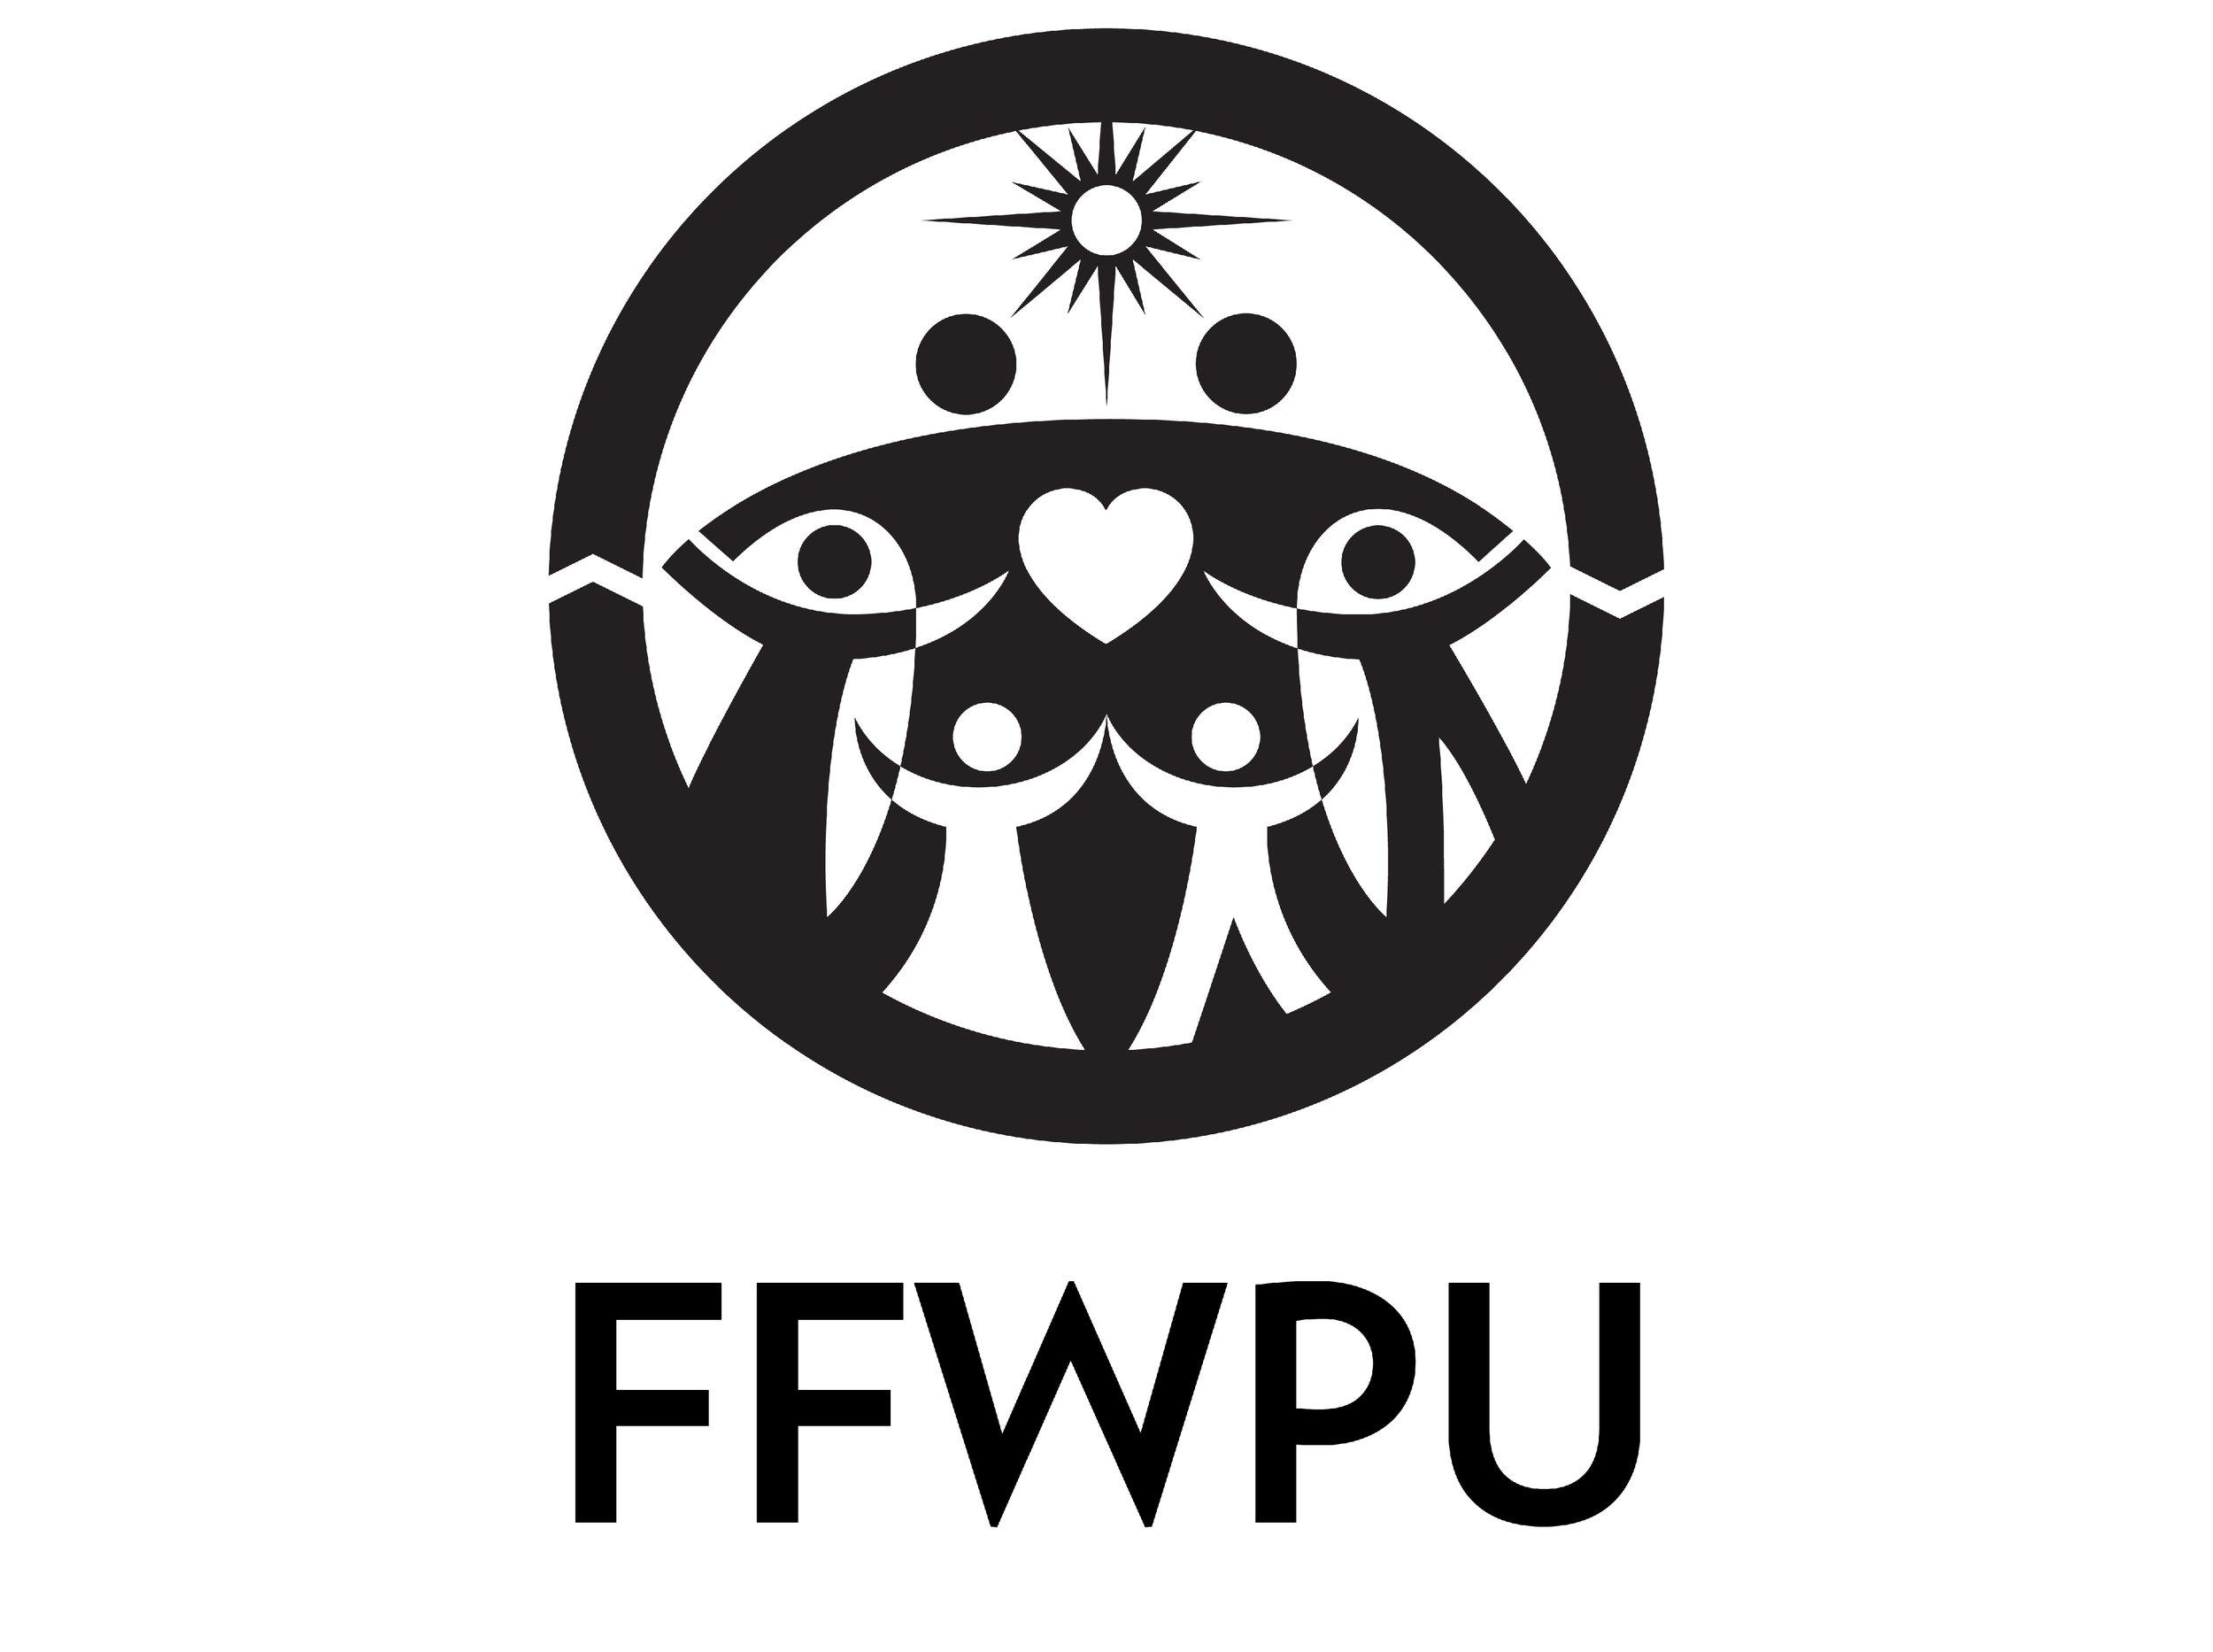 ffwpu black-01.jpg